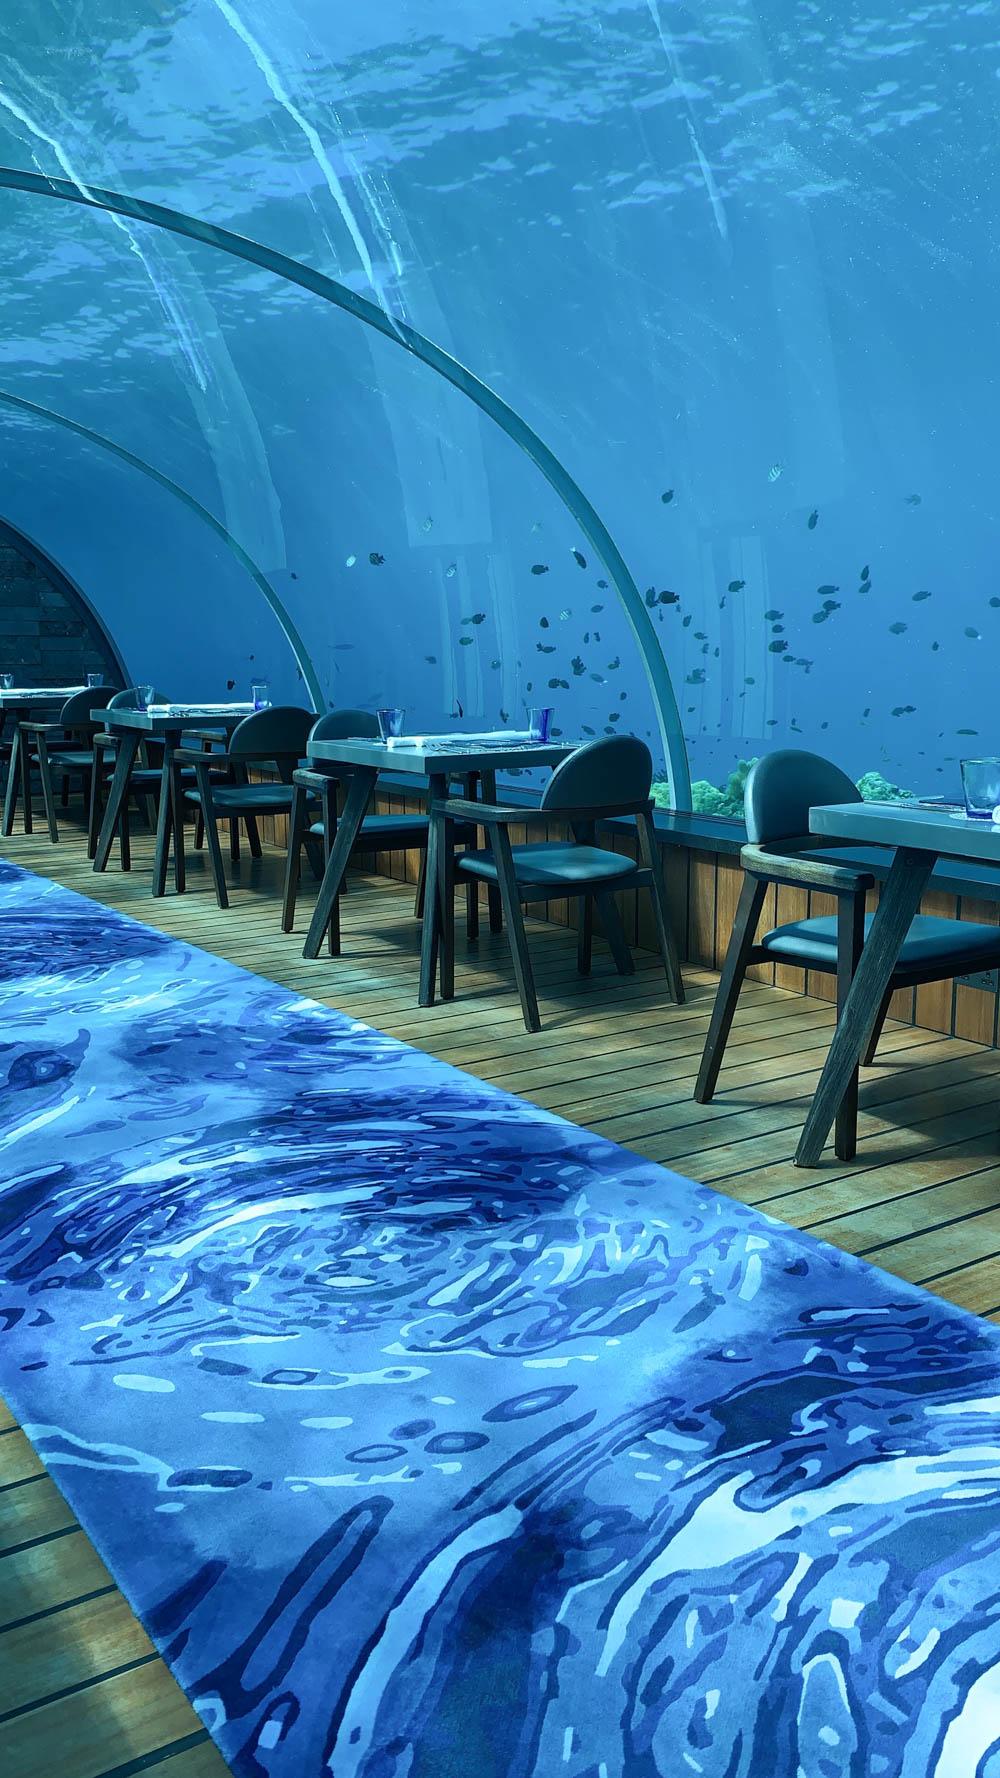 Maldives_Resort_Honeymoon_Hurawalhi_MaldivesTravelAdvisor-30.jpg